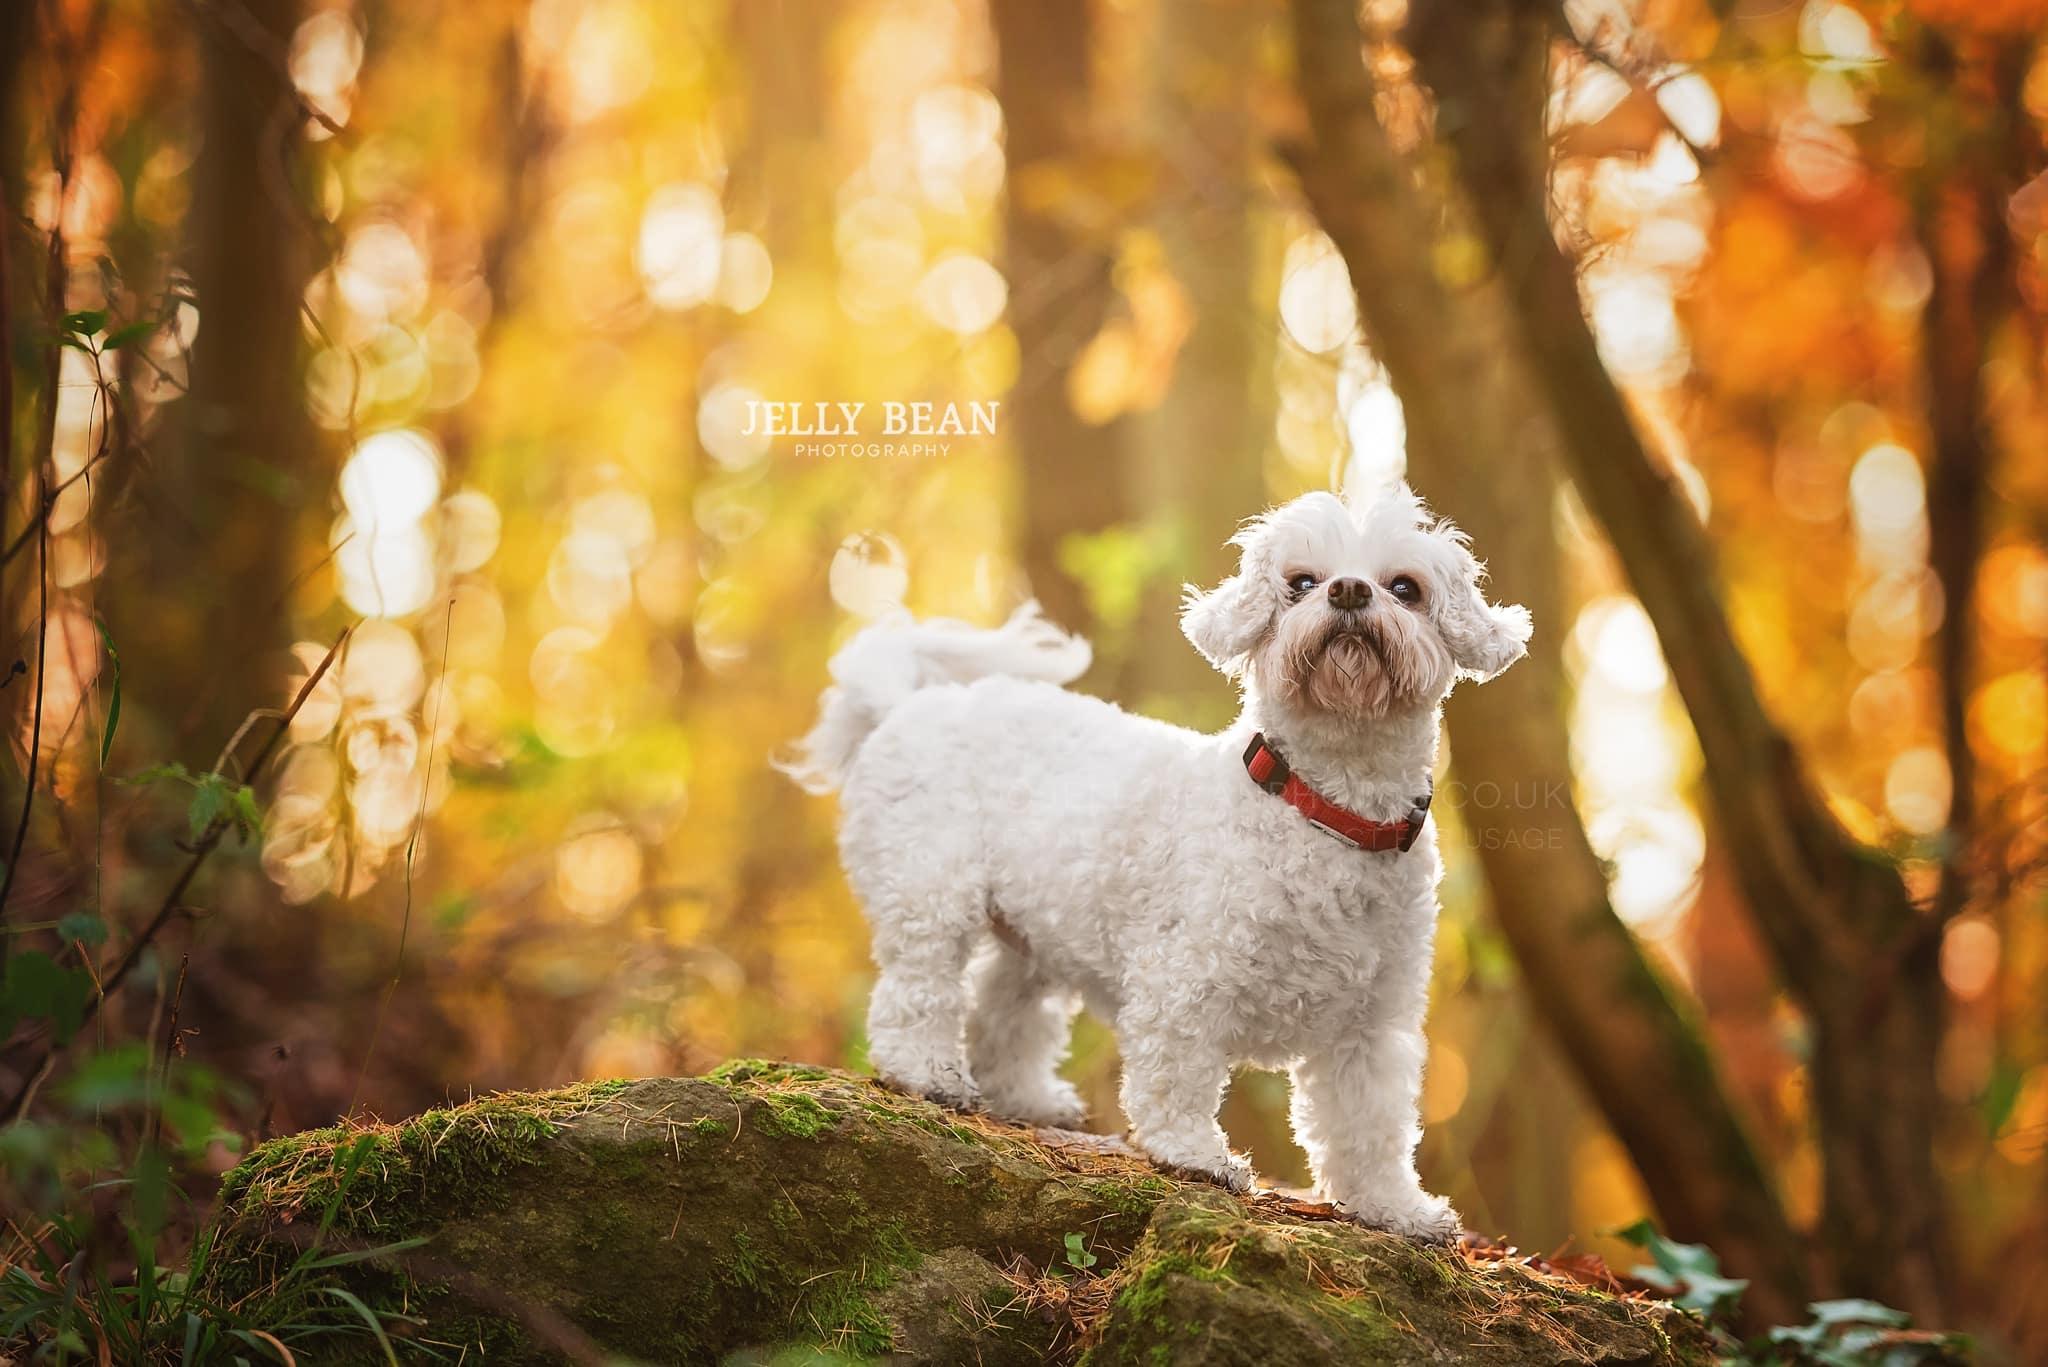 White fluffy dog on rock